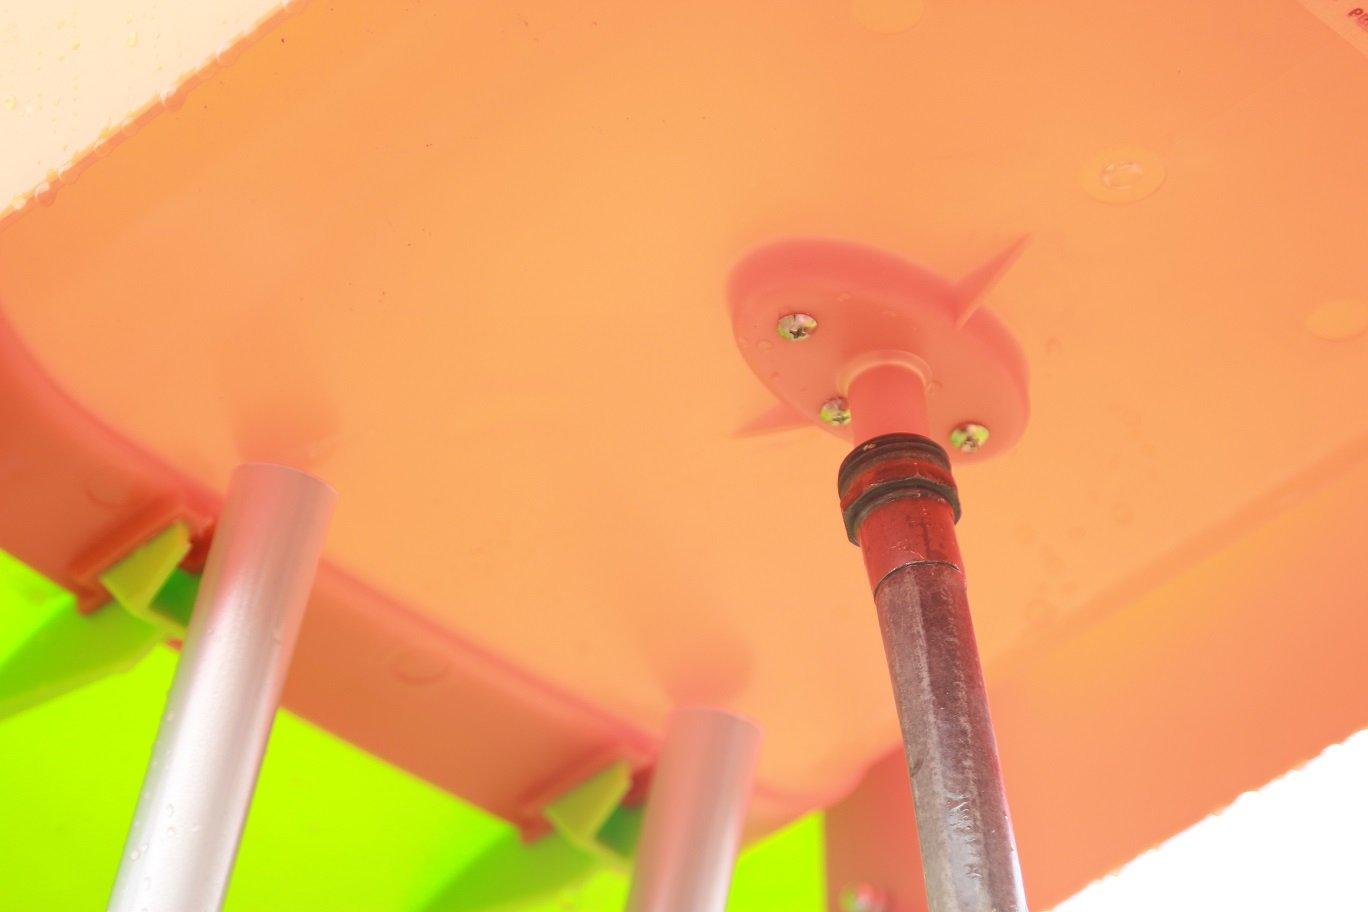 SLIDEWHIZZER Outdoor Play Set Kids Slide: 10 ft Freestanding Climber, Swingsets, Playground Jungle Gyms Kids Love - Above Ground Pool Slide for Summer Backyard by SLIDEWHIZZER (Image #5)